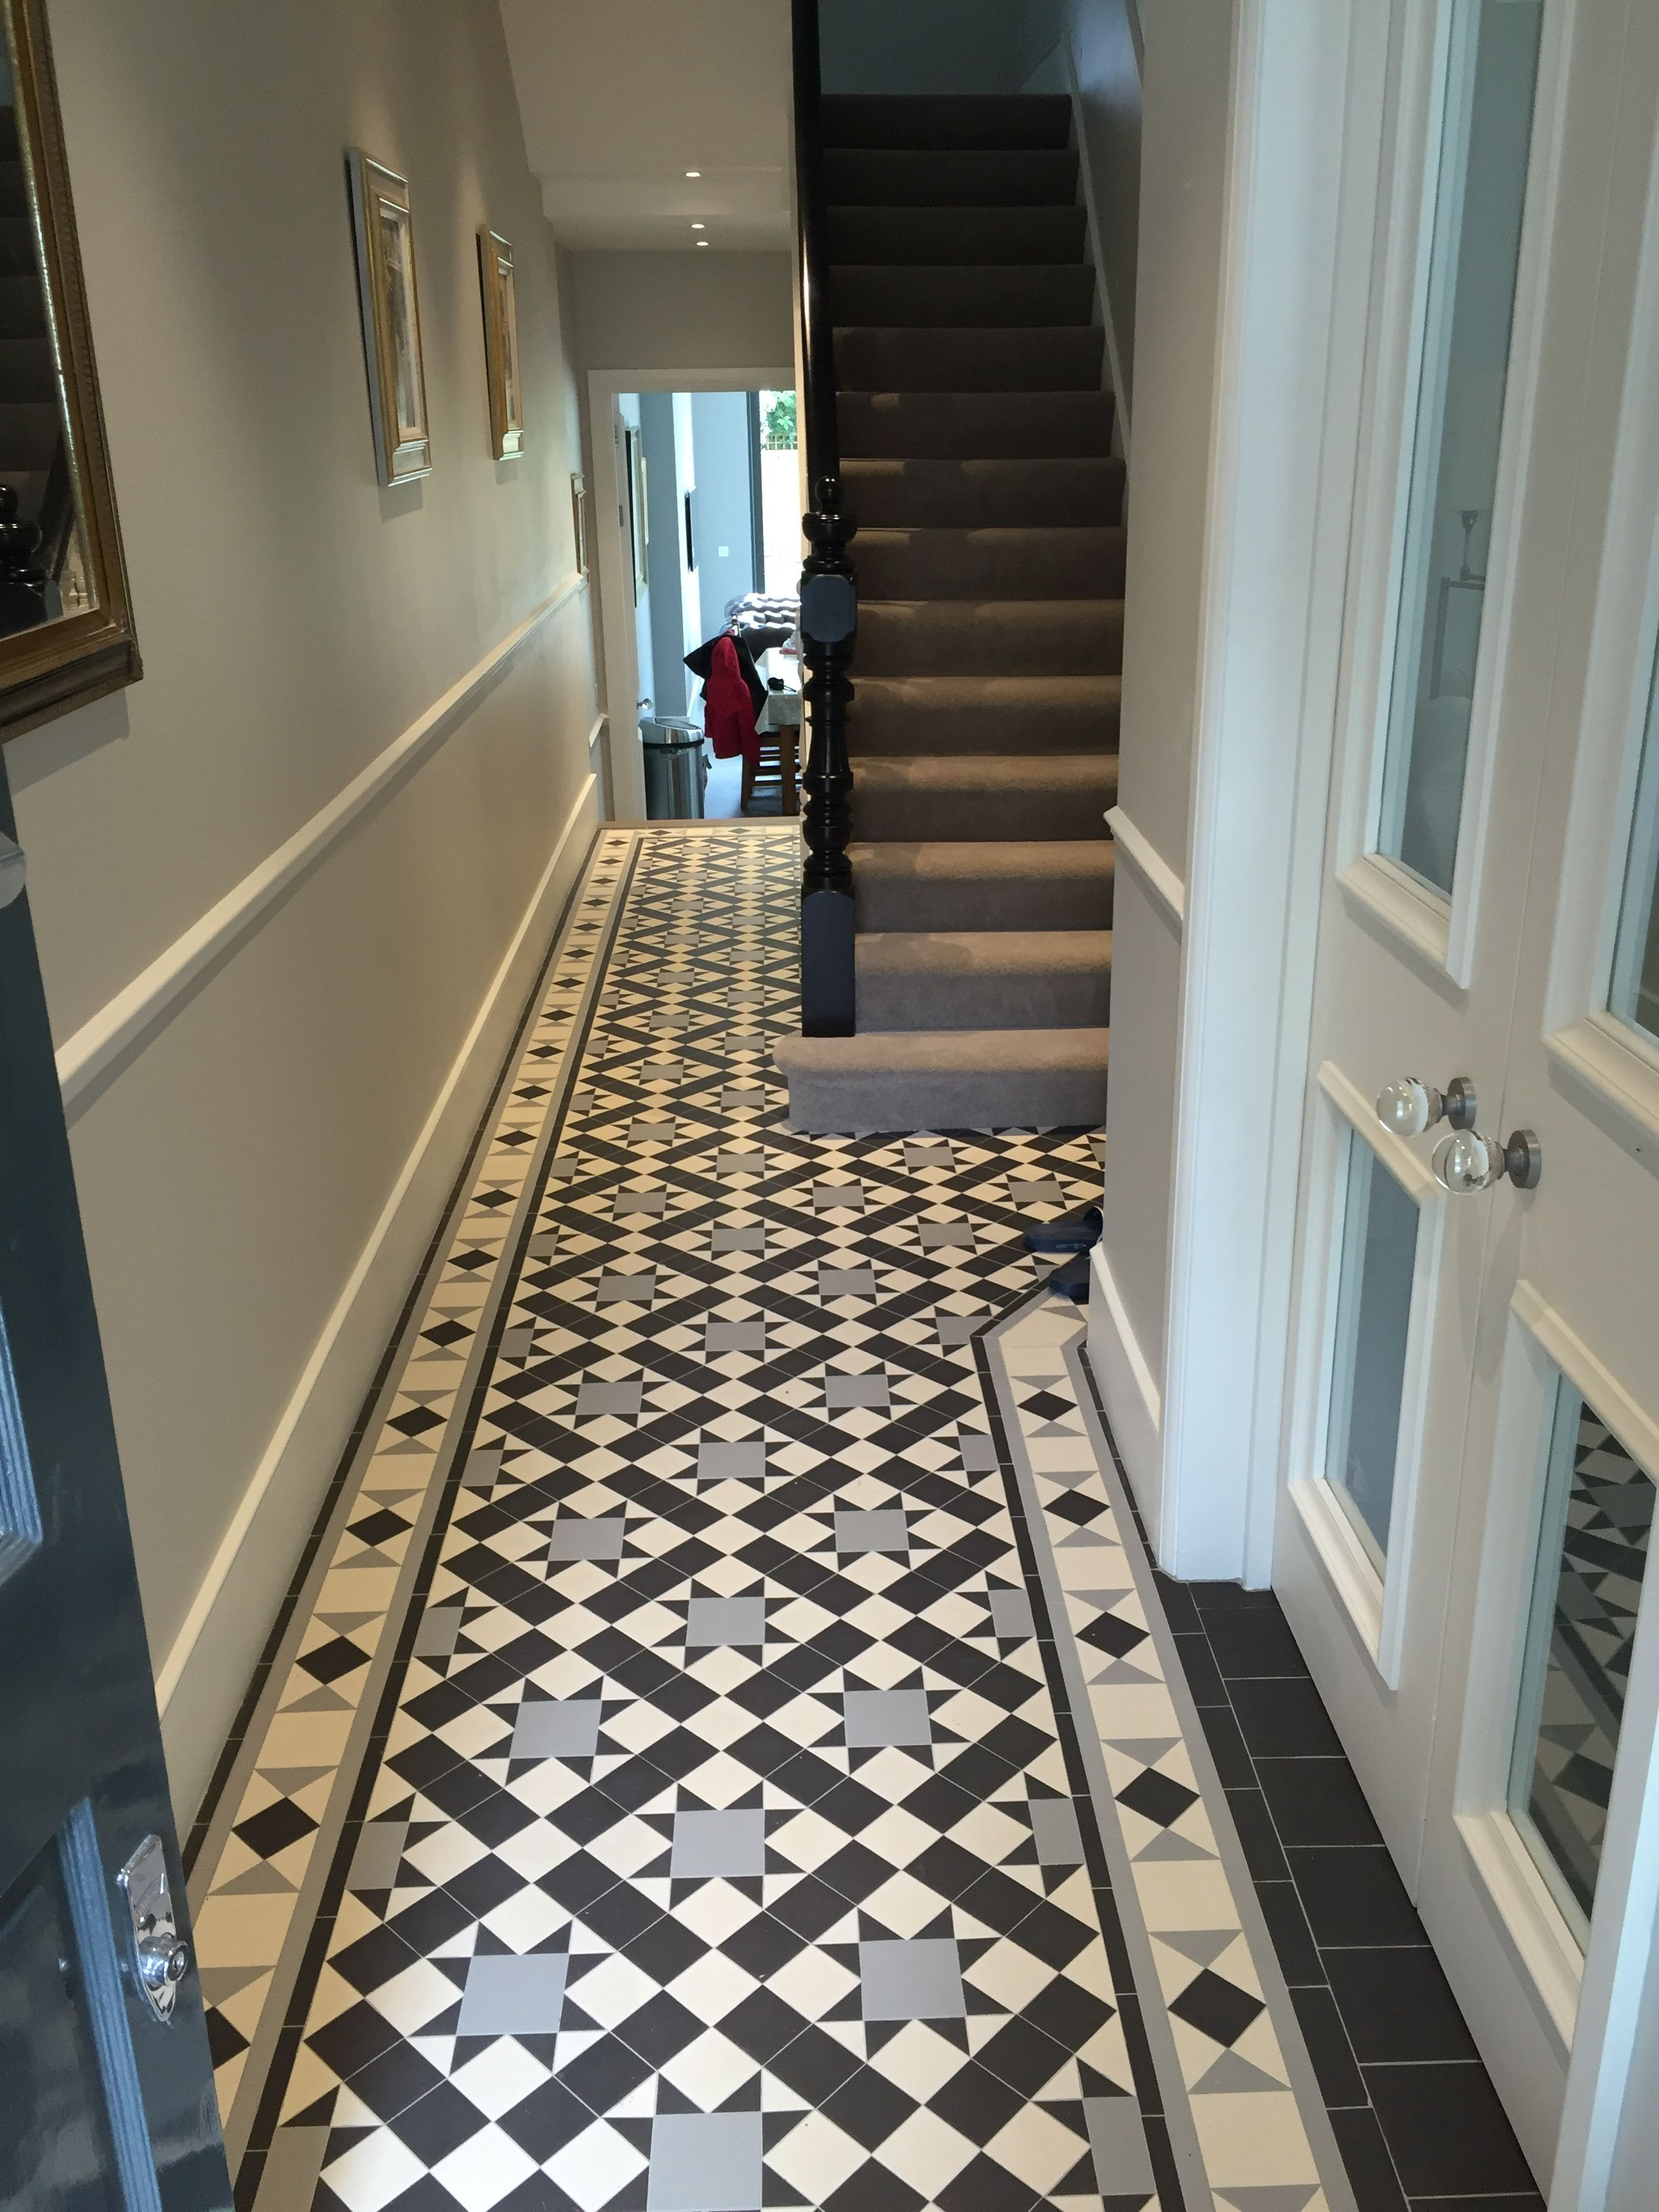 Tiled Floor Plain Stair Carpet Edwardian House Victorian Hallway Tiles